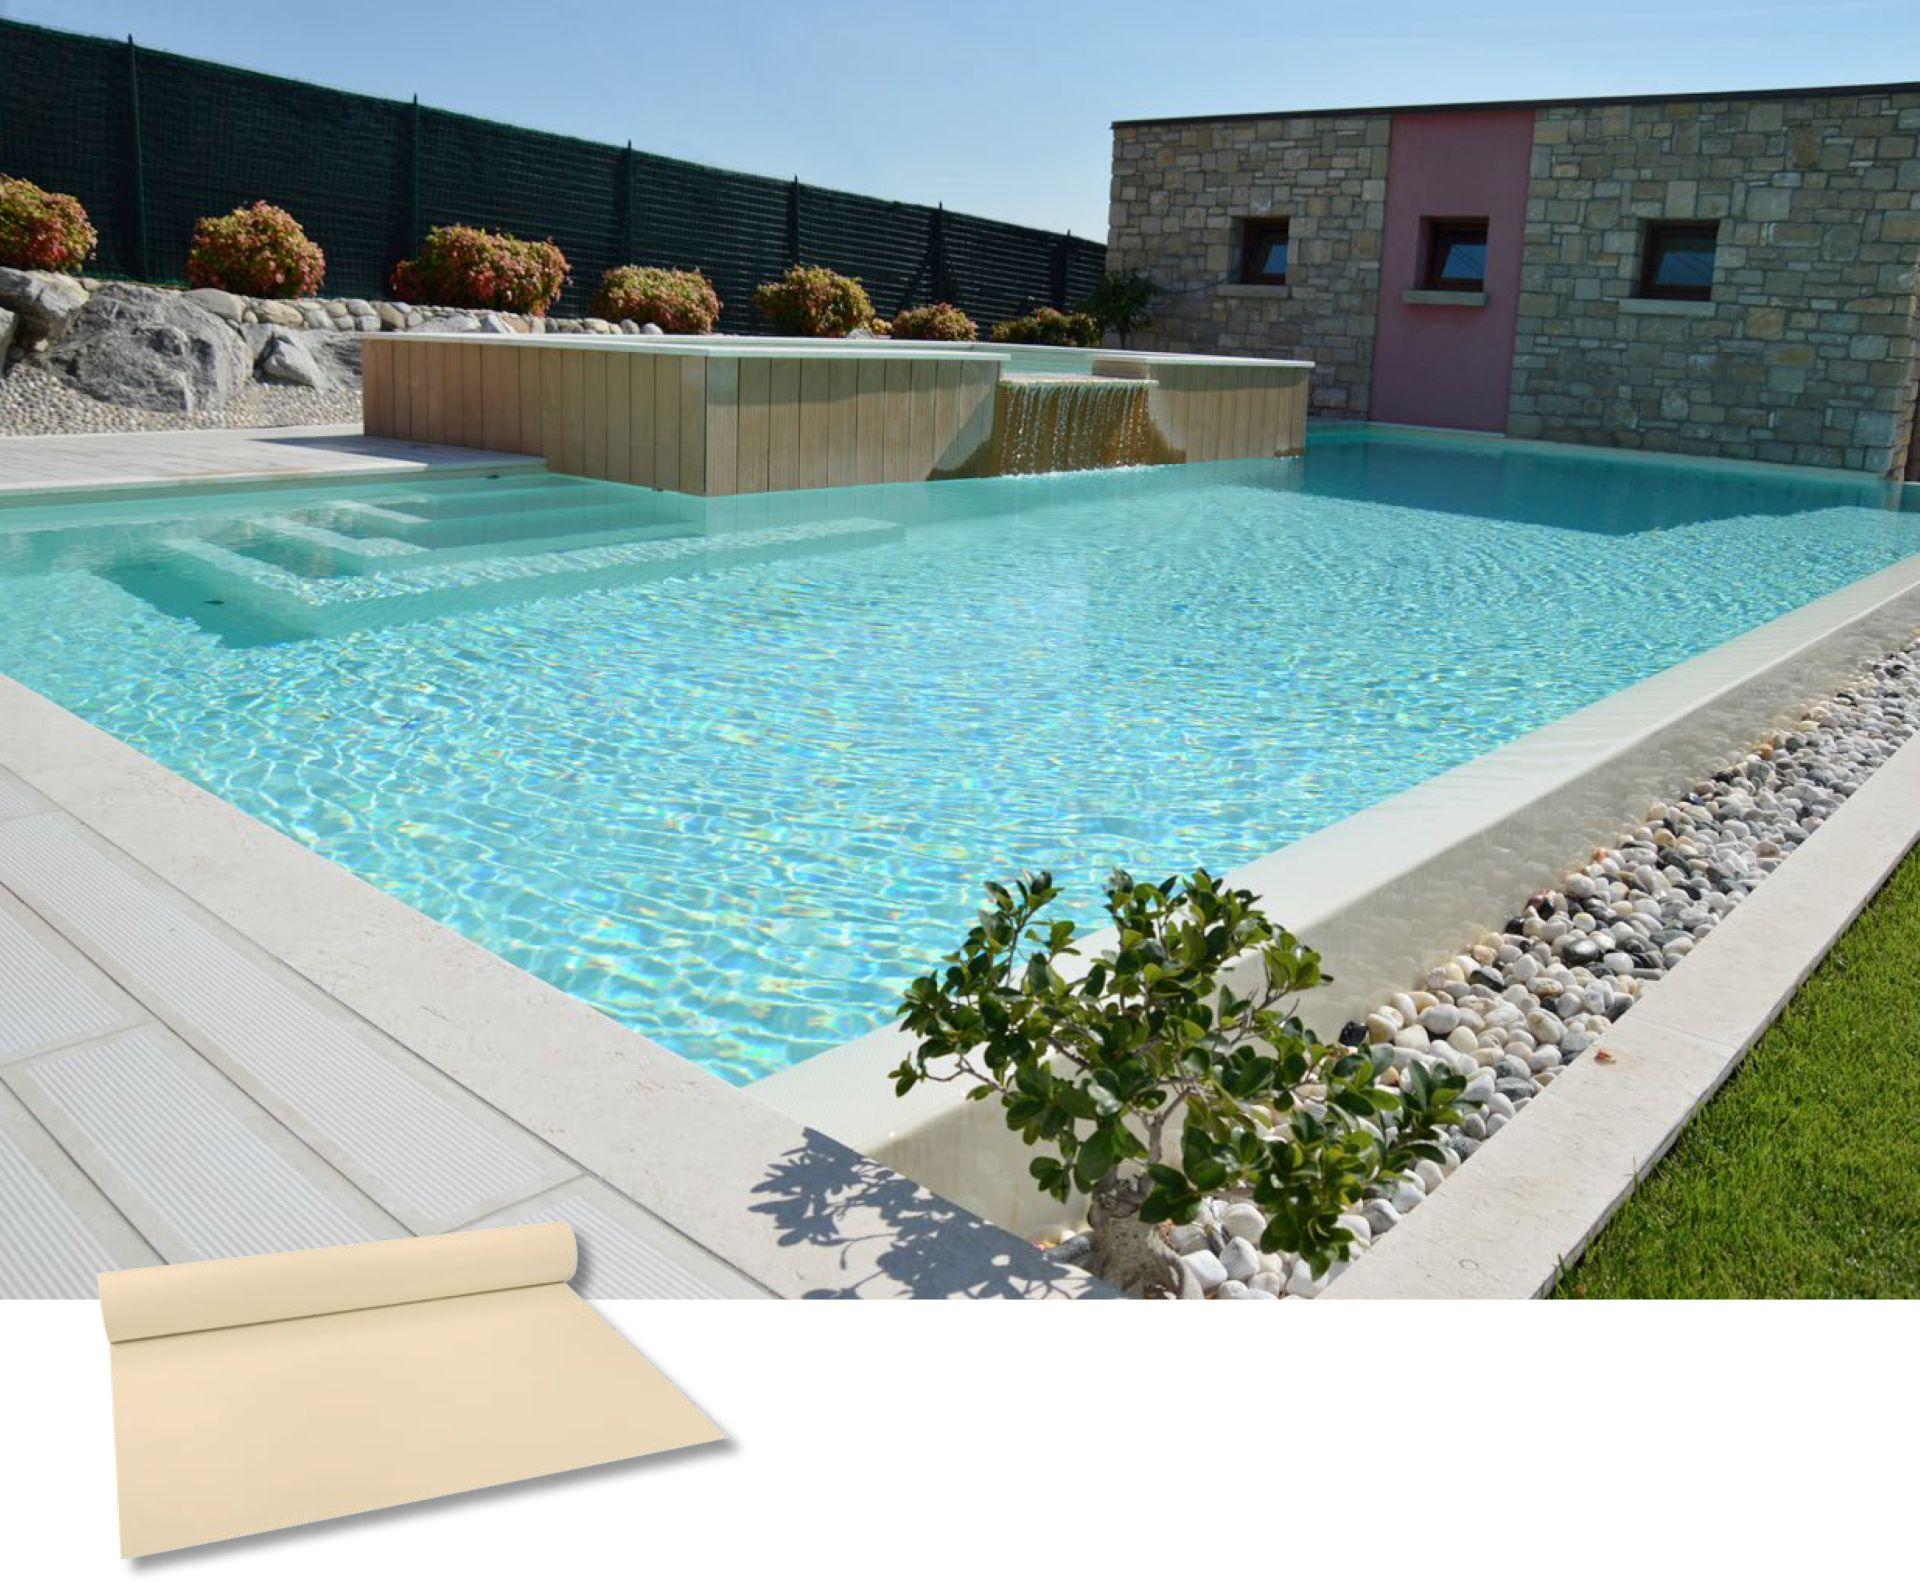 sand alkorplan 2000 folie renolit alkorplan artikel. Black Bedroom Furniture Sets. Home Design Ideas